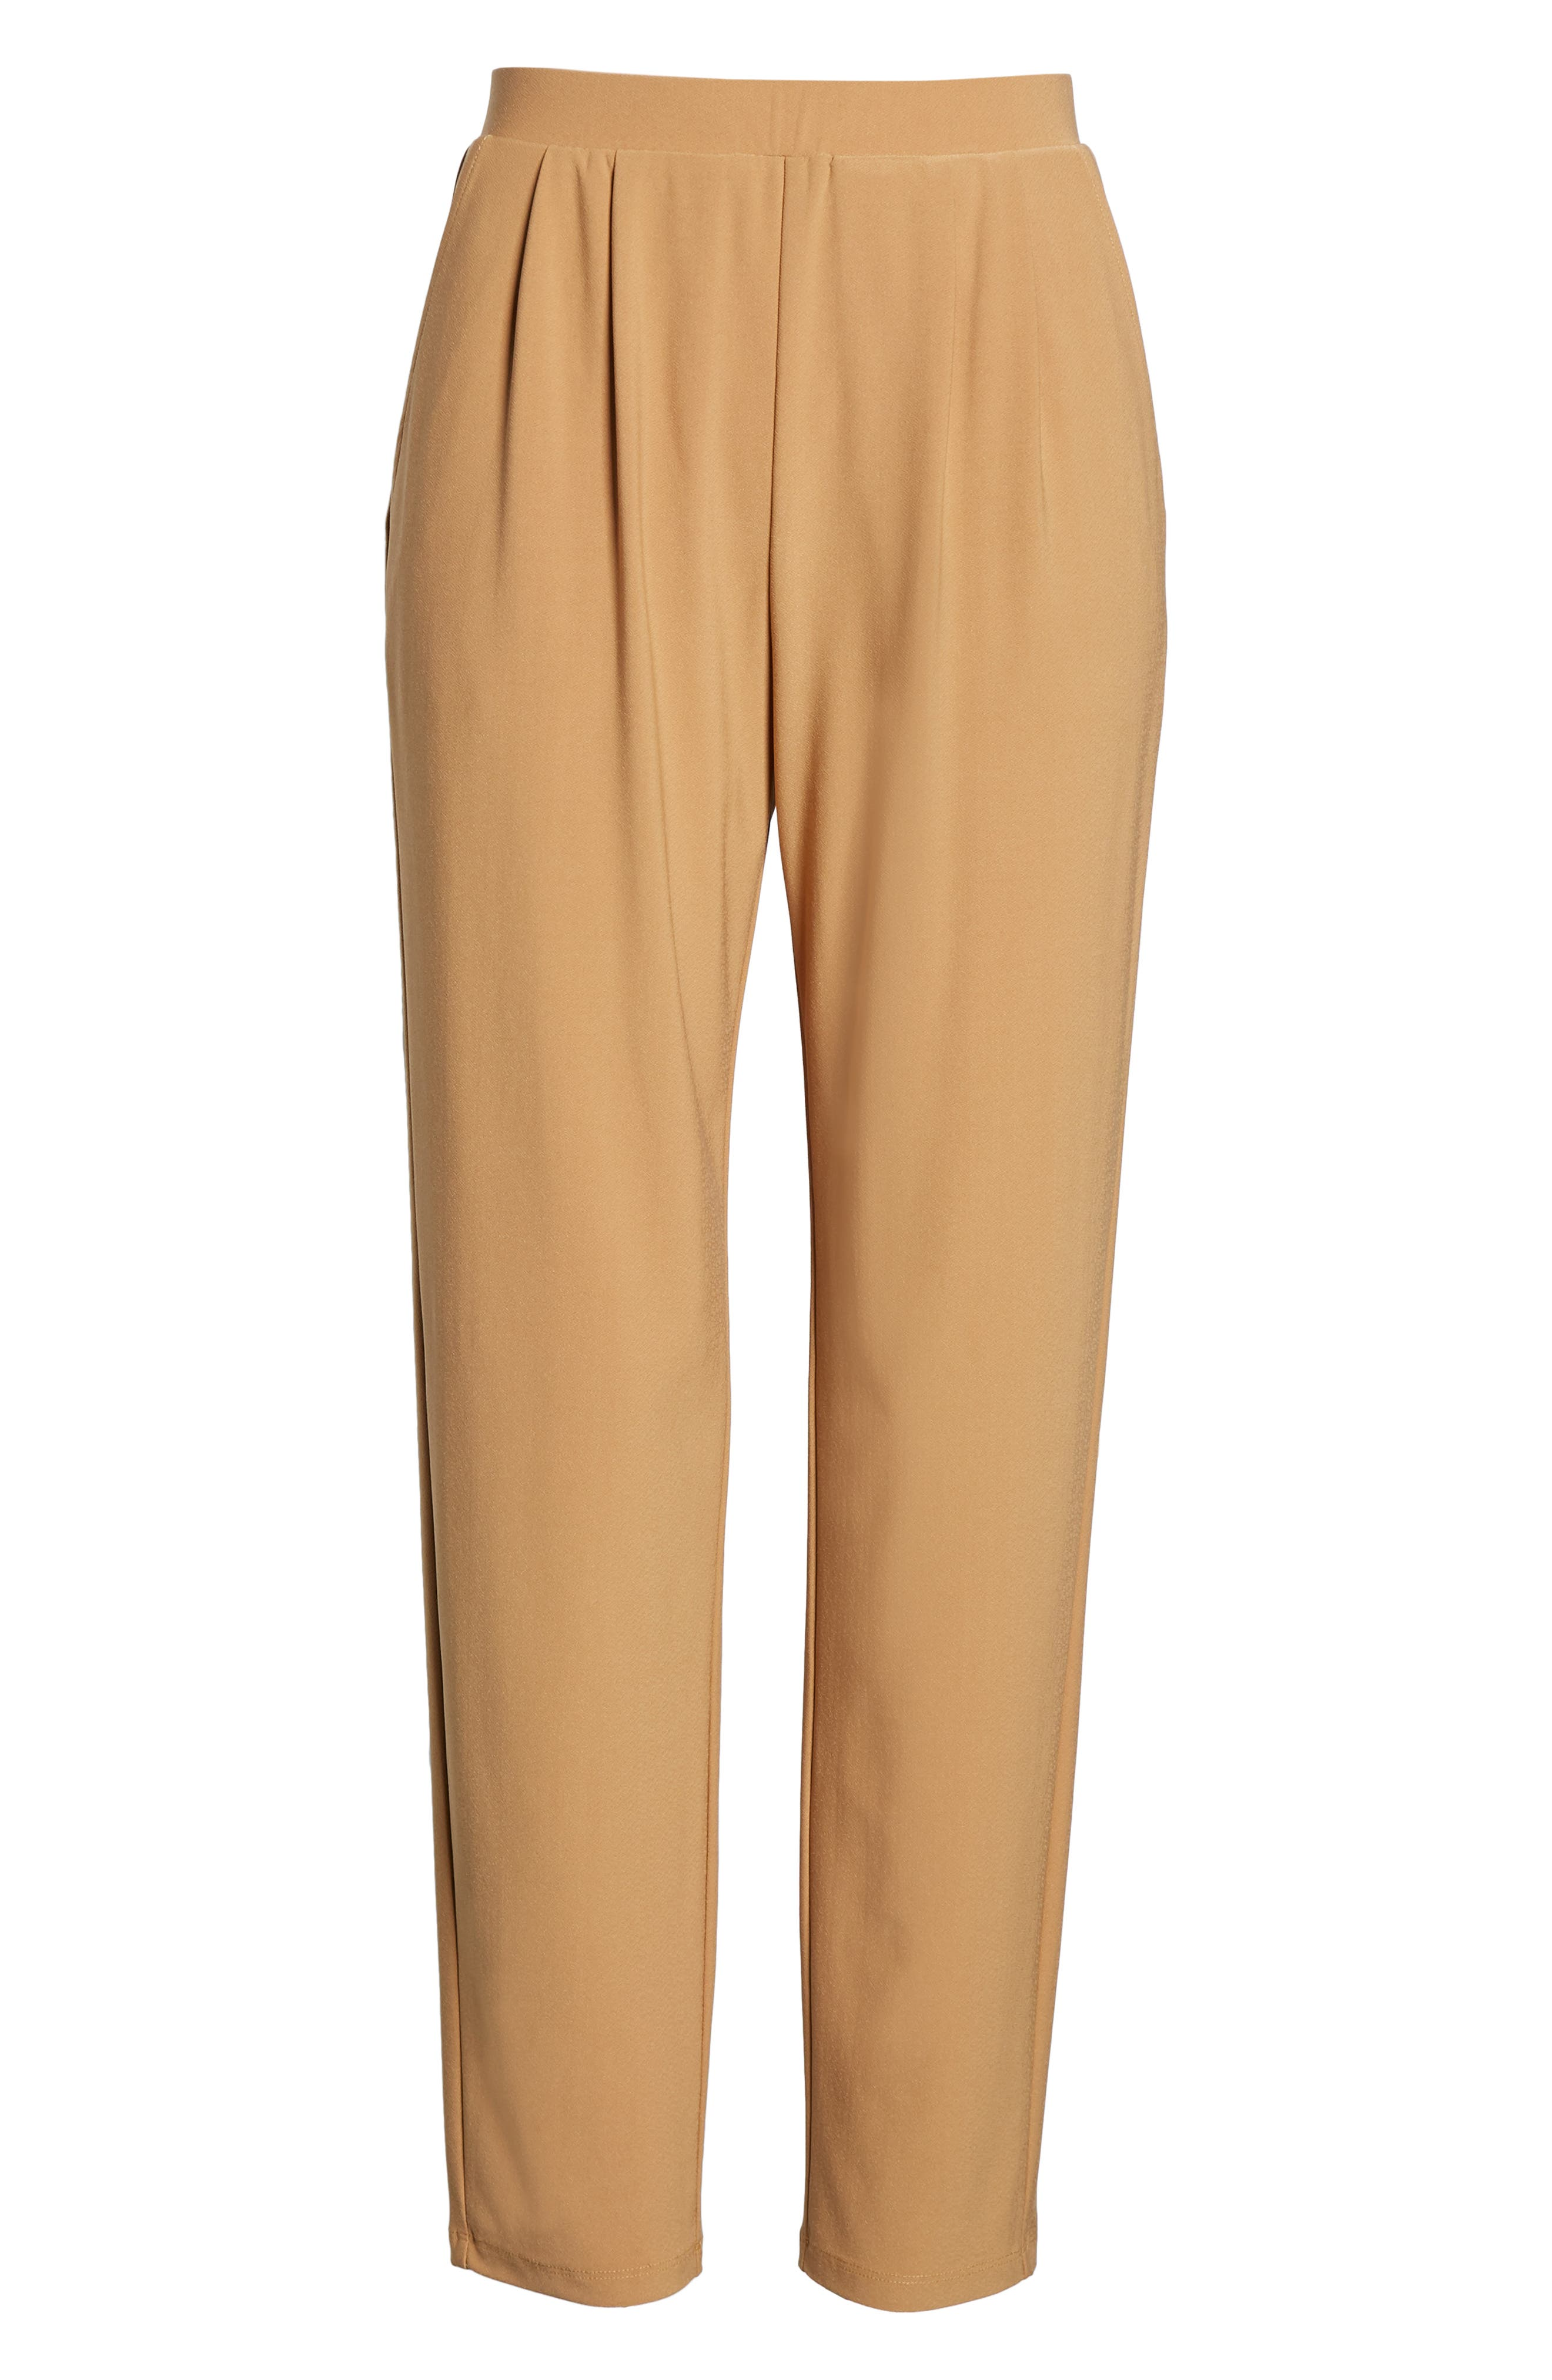 LEITH,                             Pleat Front Trousers,                             Alternate thumbnail 7, color,                             TAN DALE